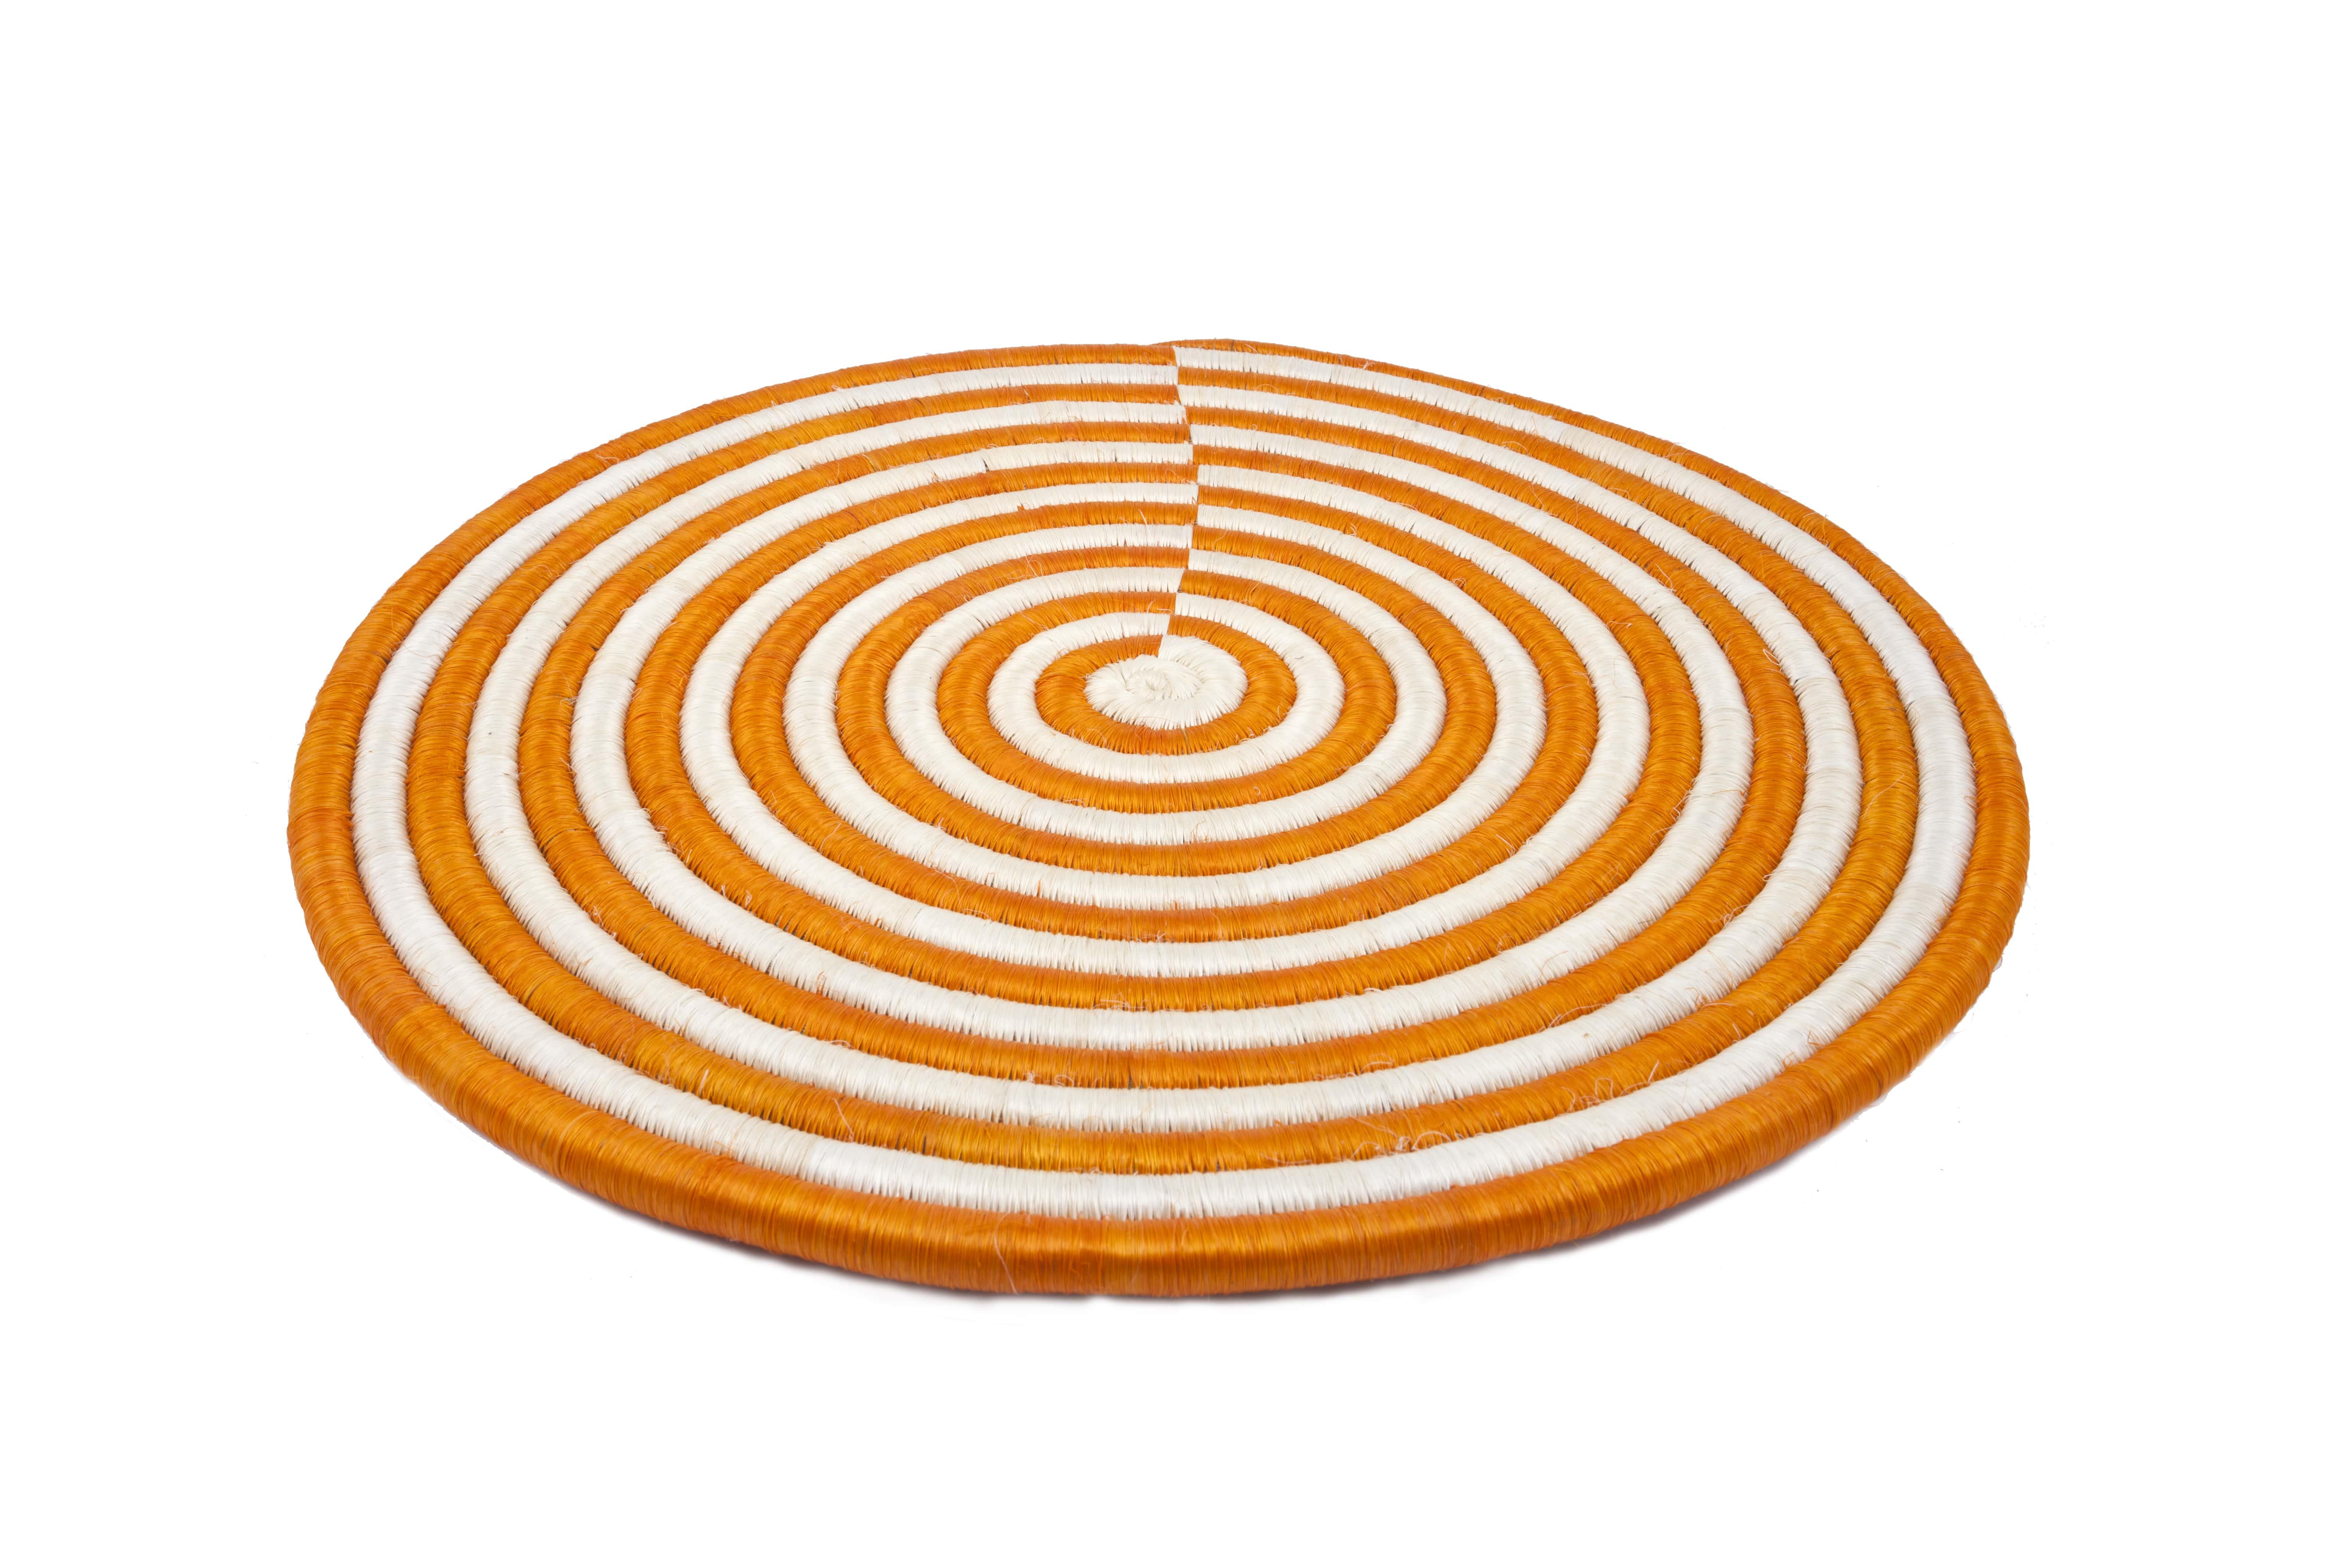 Juego de individuales Guacamayas, naranja